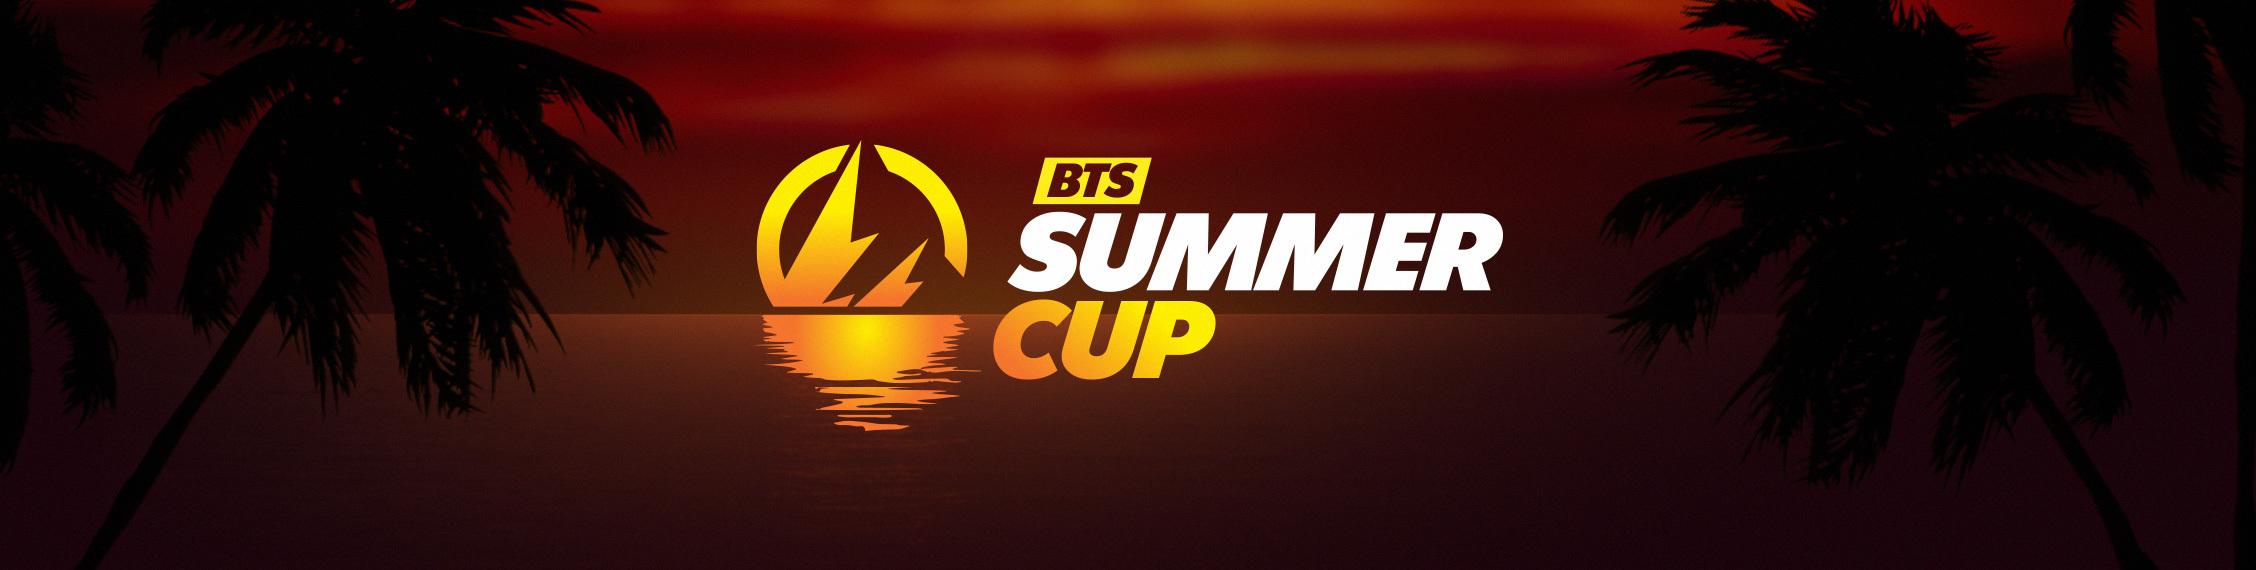 BTS Summer Cup